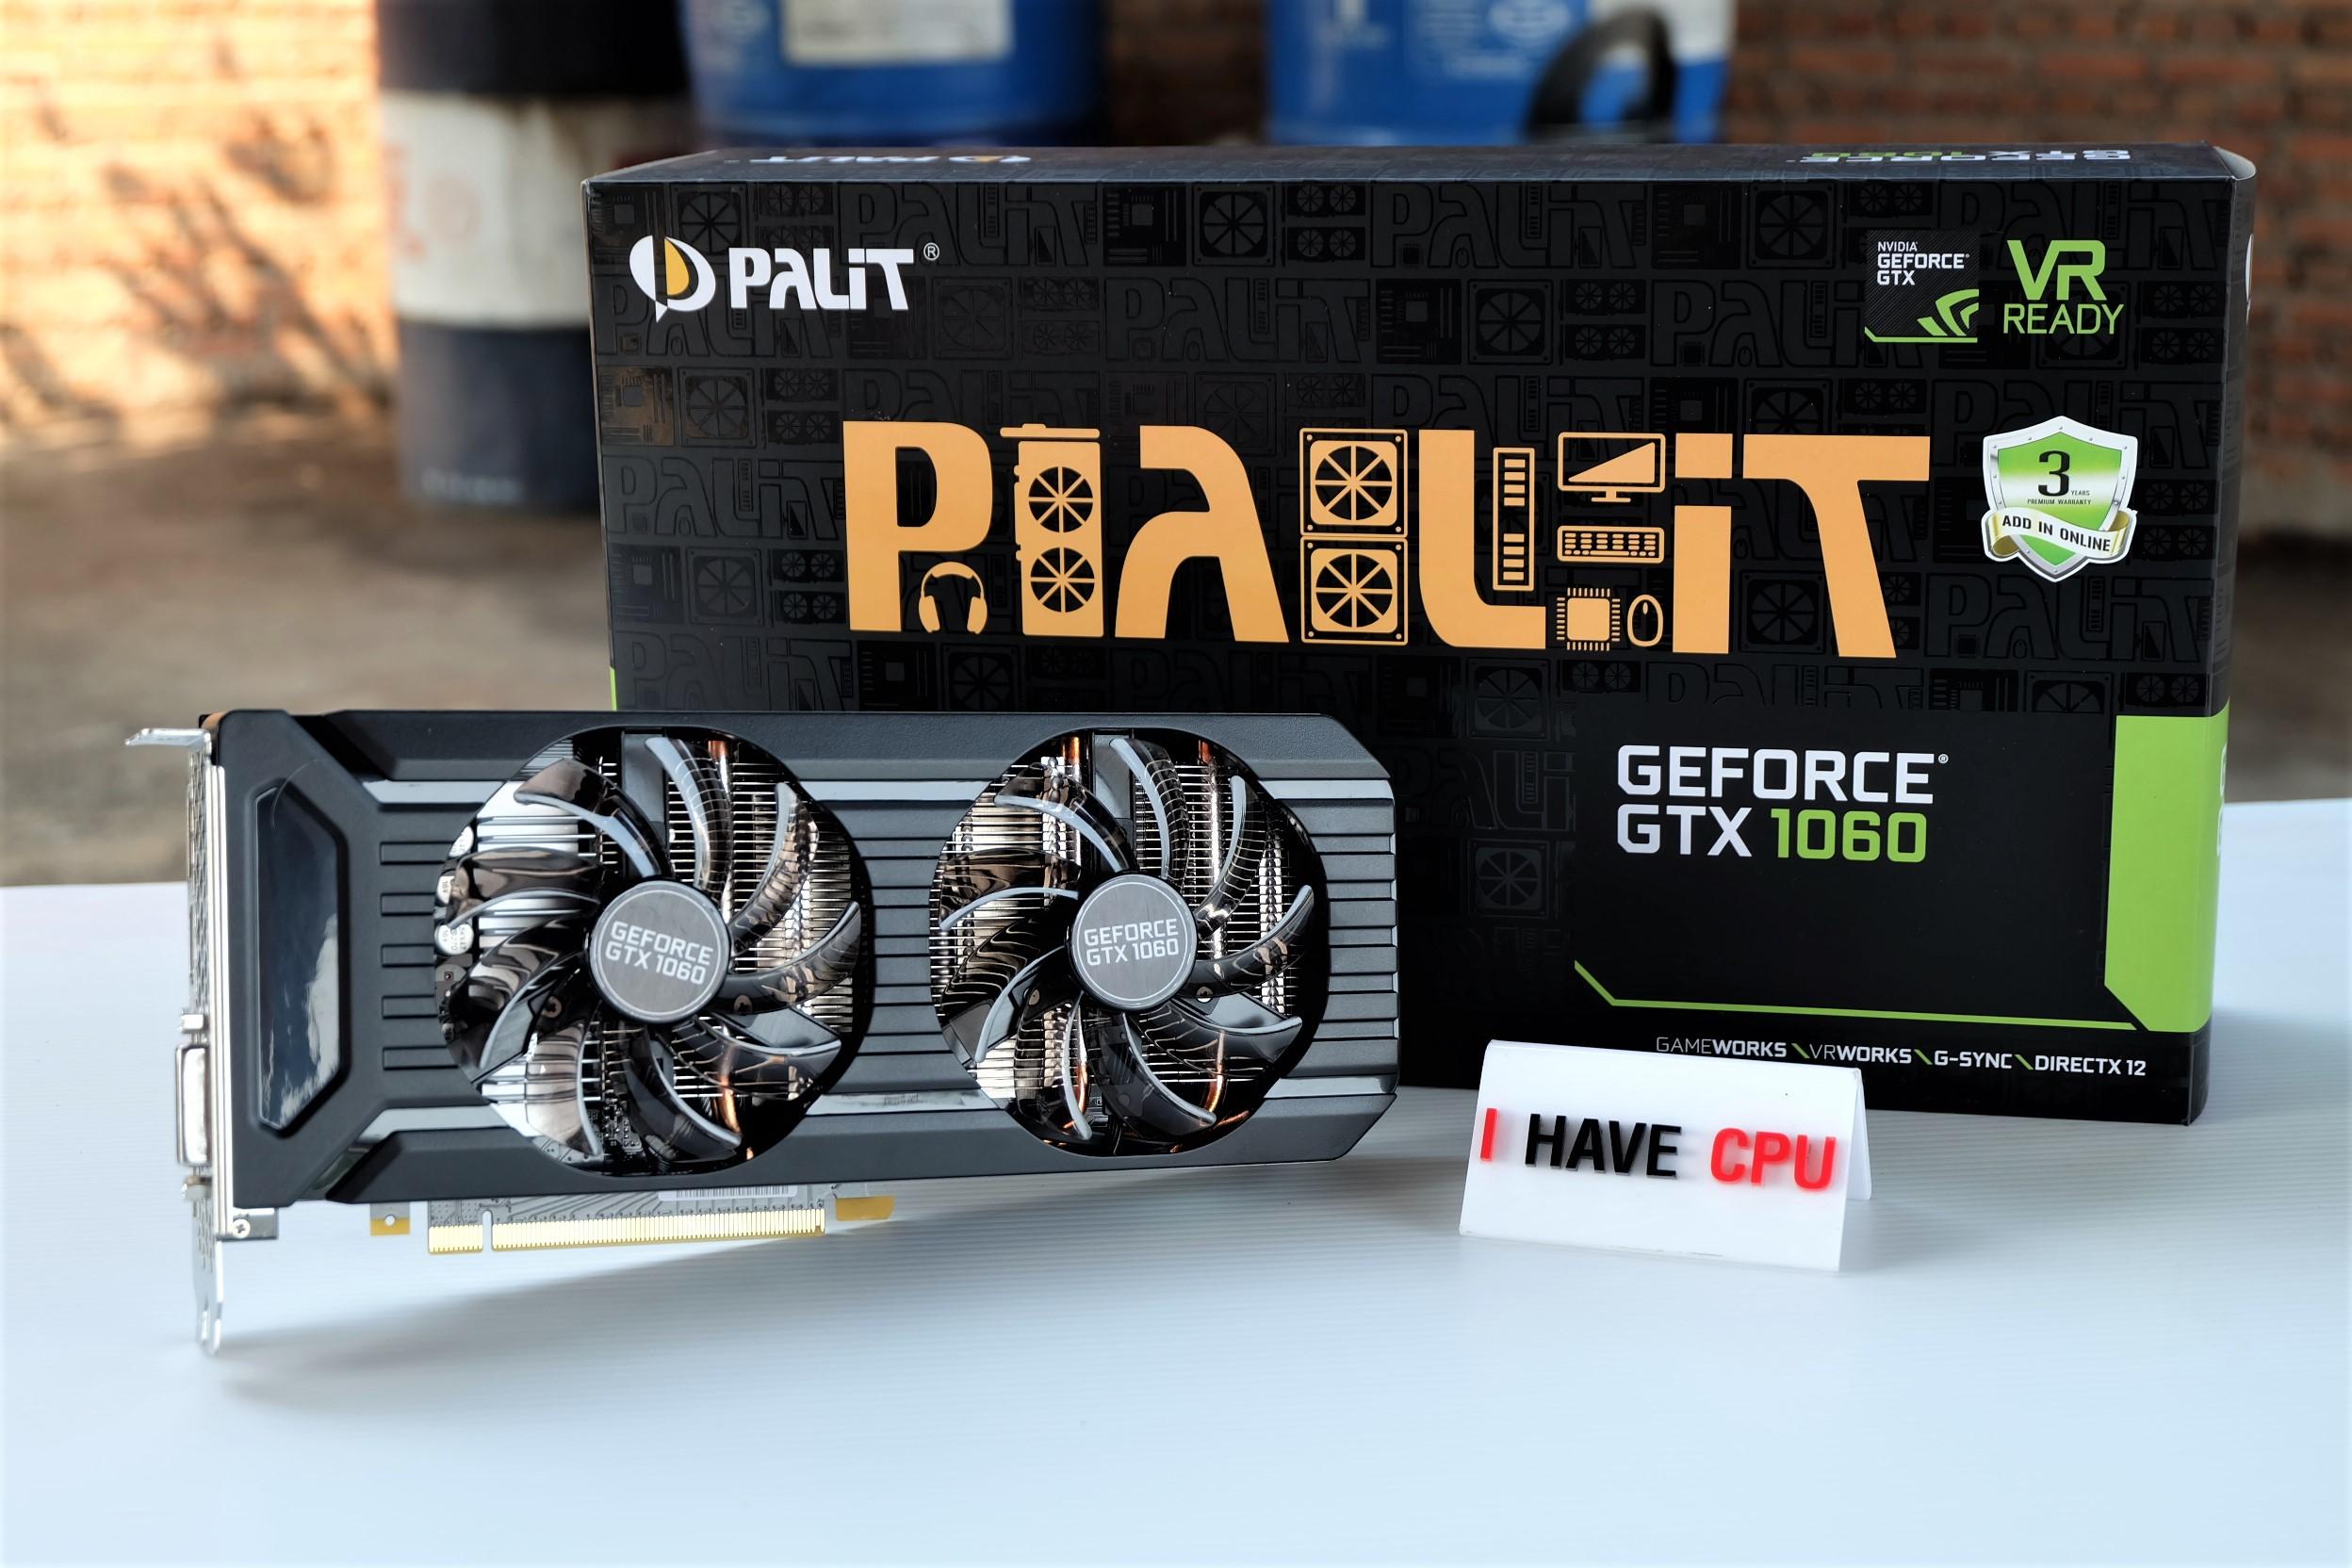 PALIT GeForce GTX 1060 Dual 6GB GDDR5 ของใหม่